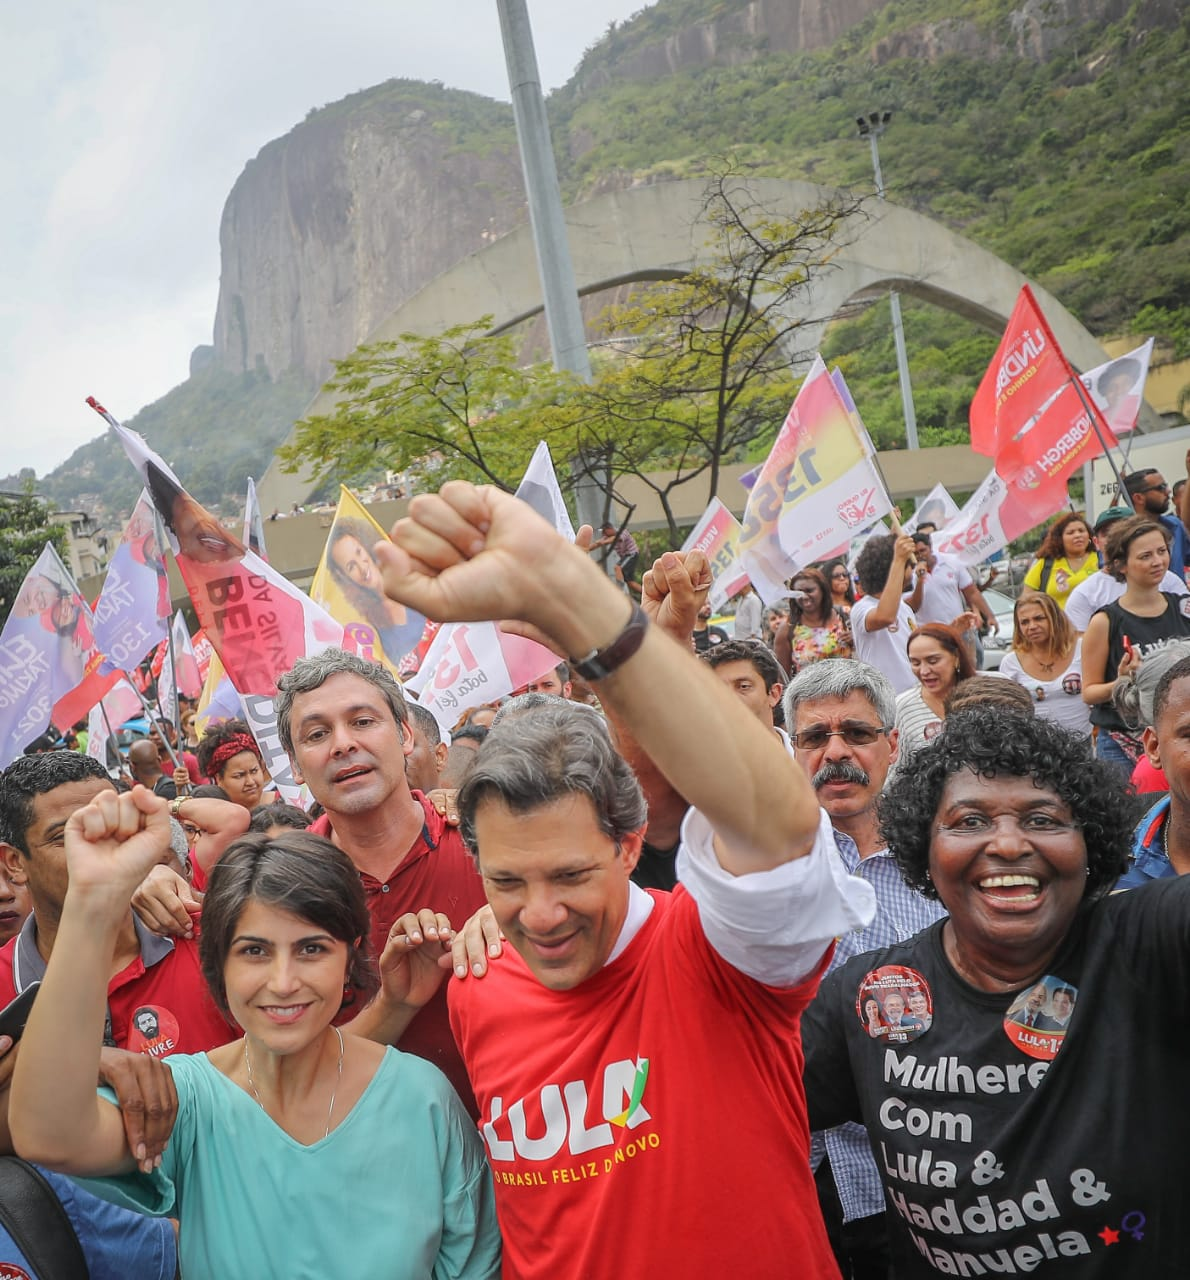 Entre as mulheres, Haddad já vence Bolsonaro no segundo turno: 44% a 38%